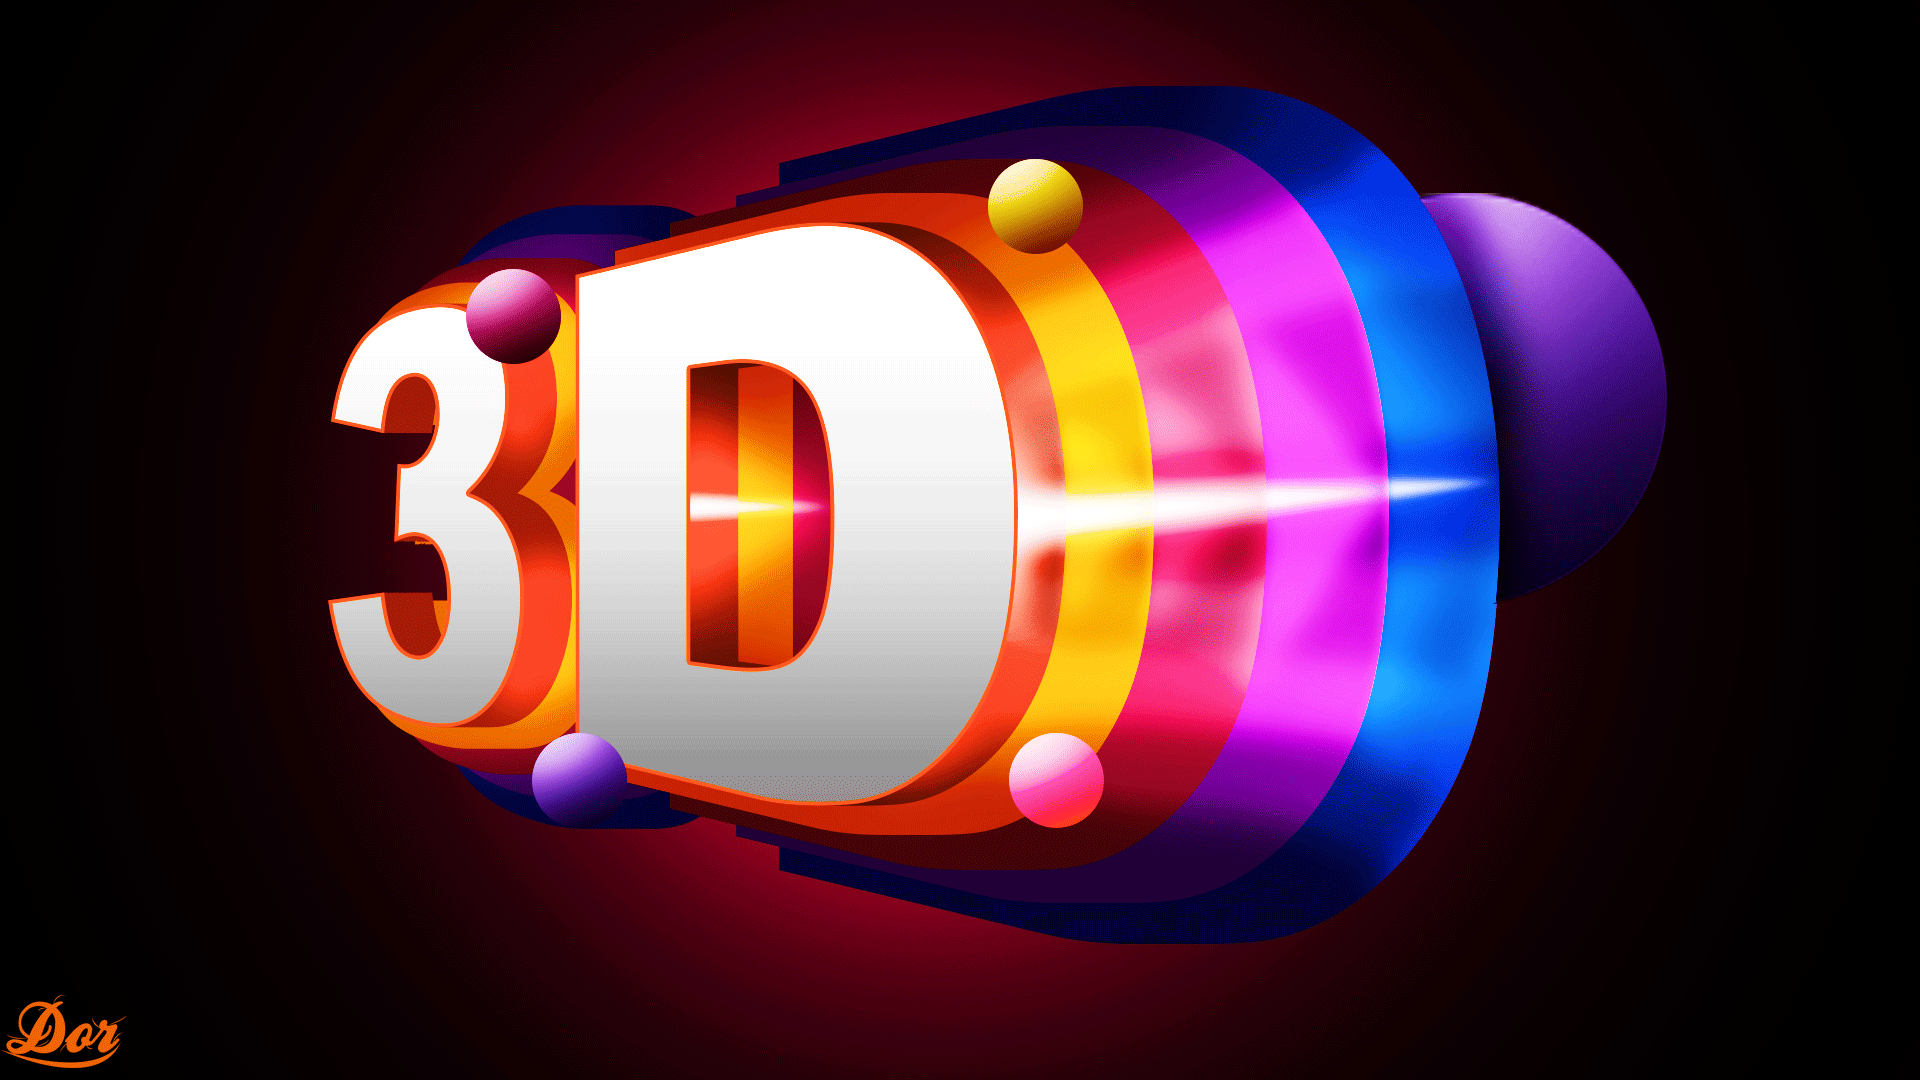 3D Logo. by DorGD